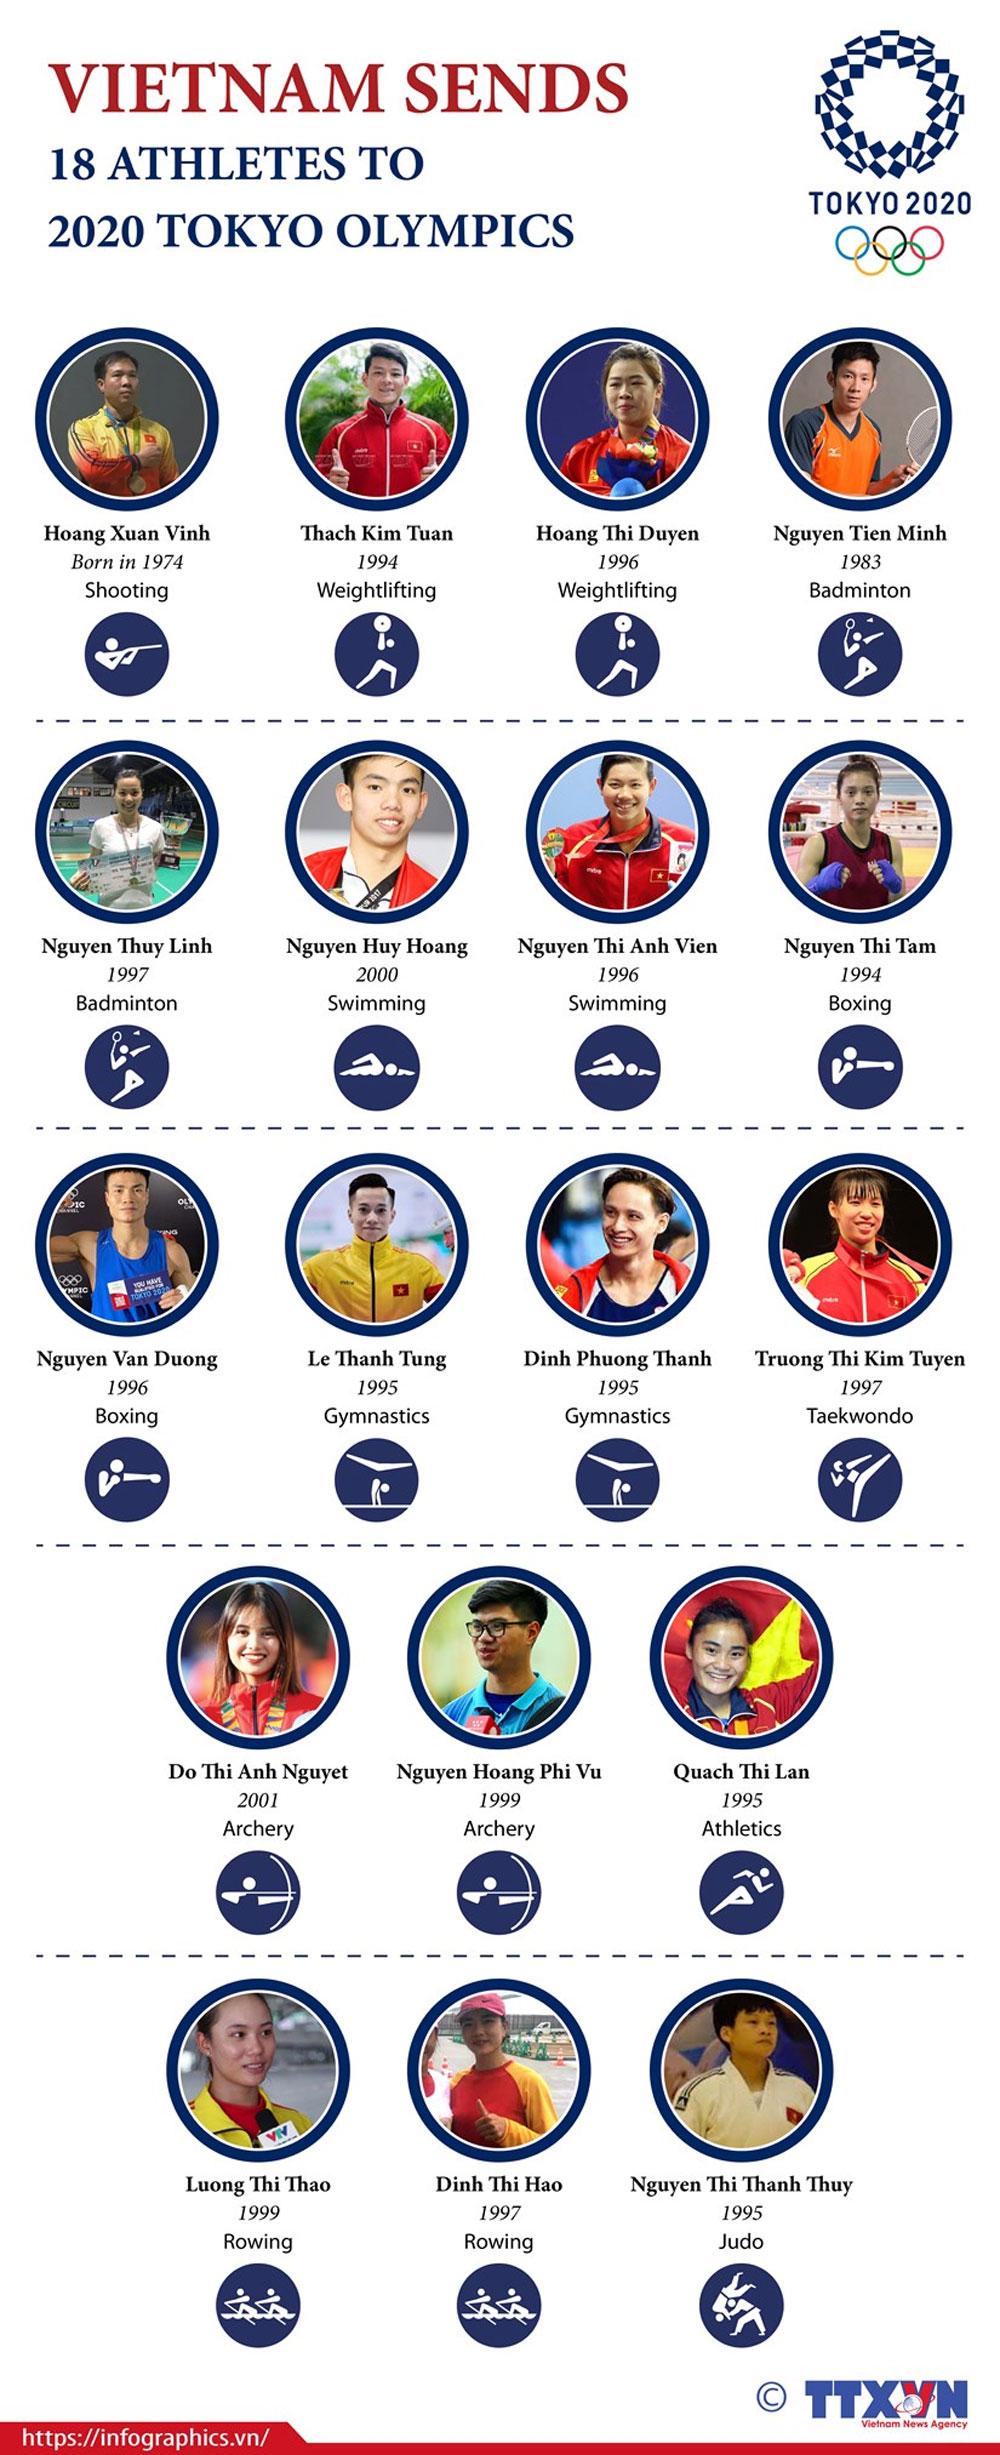 Vietnam, 18 athletes, 2020 Tokyo Olympics, shooting, weightlifting, badminton, swimming, rowing, judo